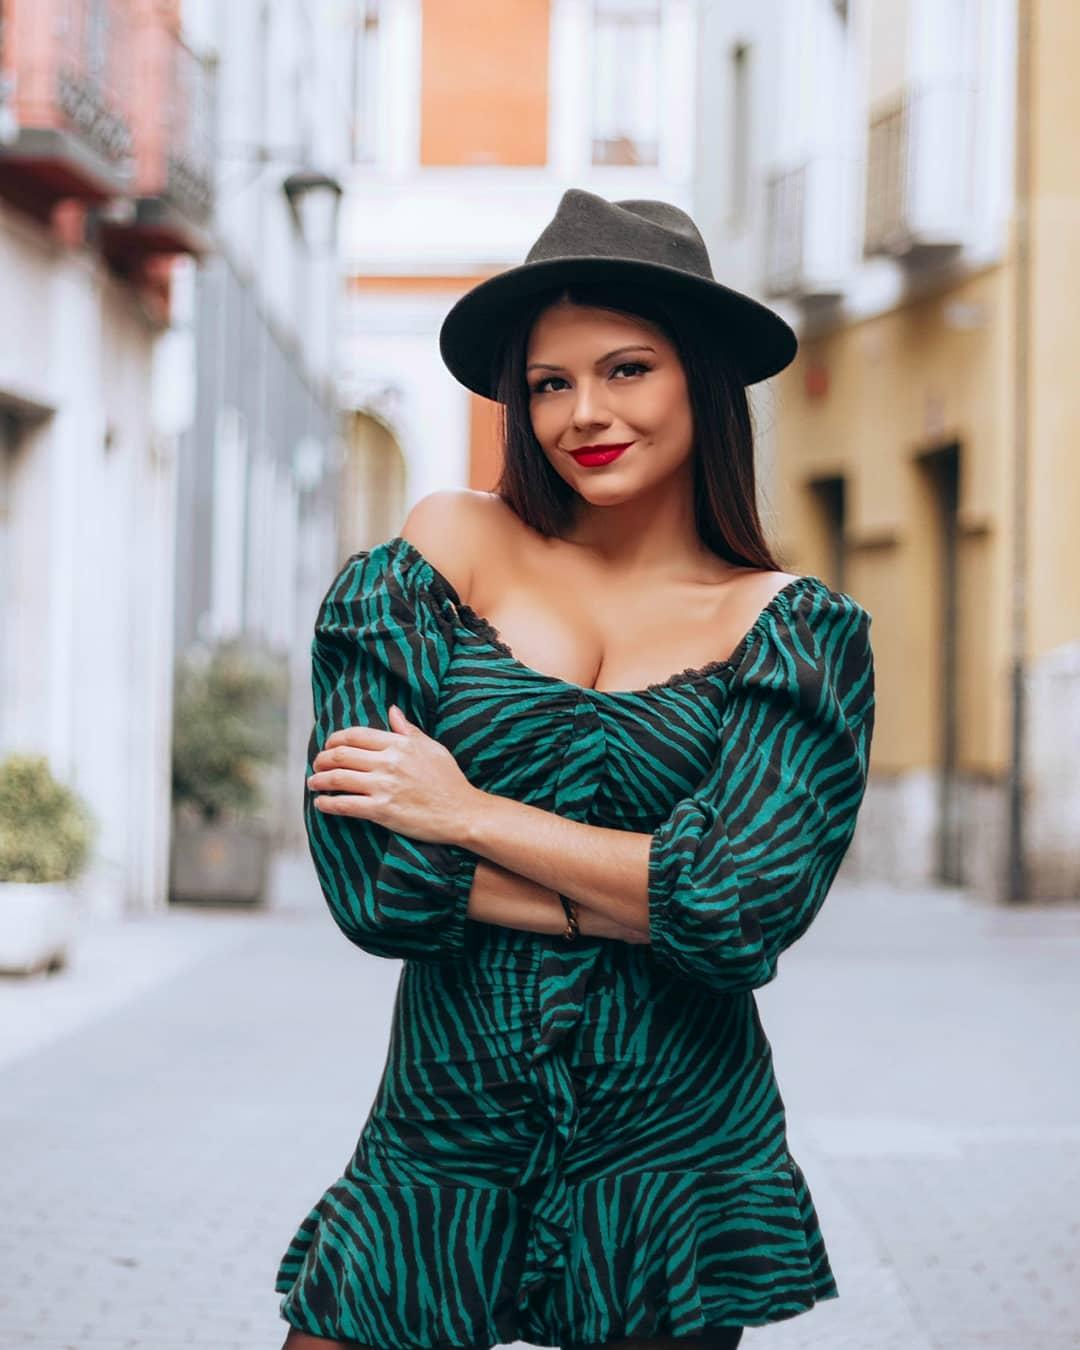 printed dress with ruffles de Zara sur mairitalejita